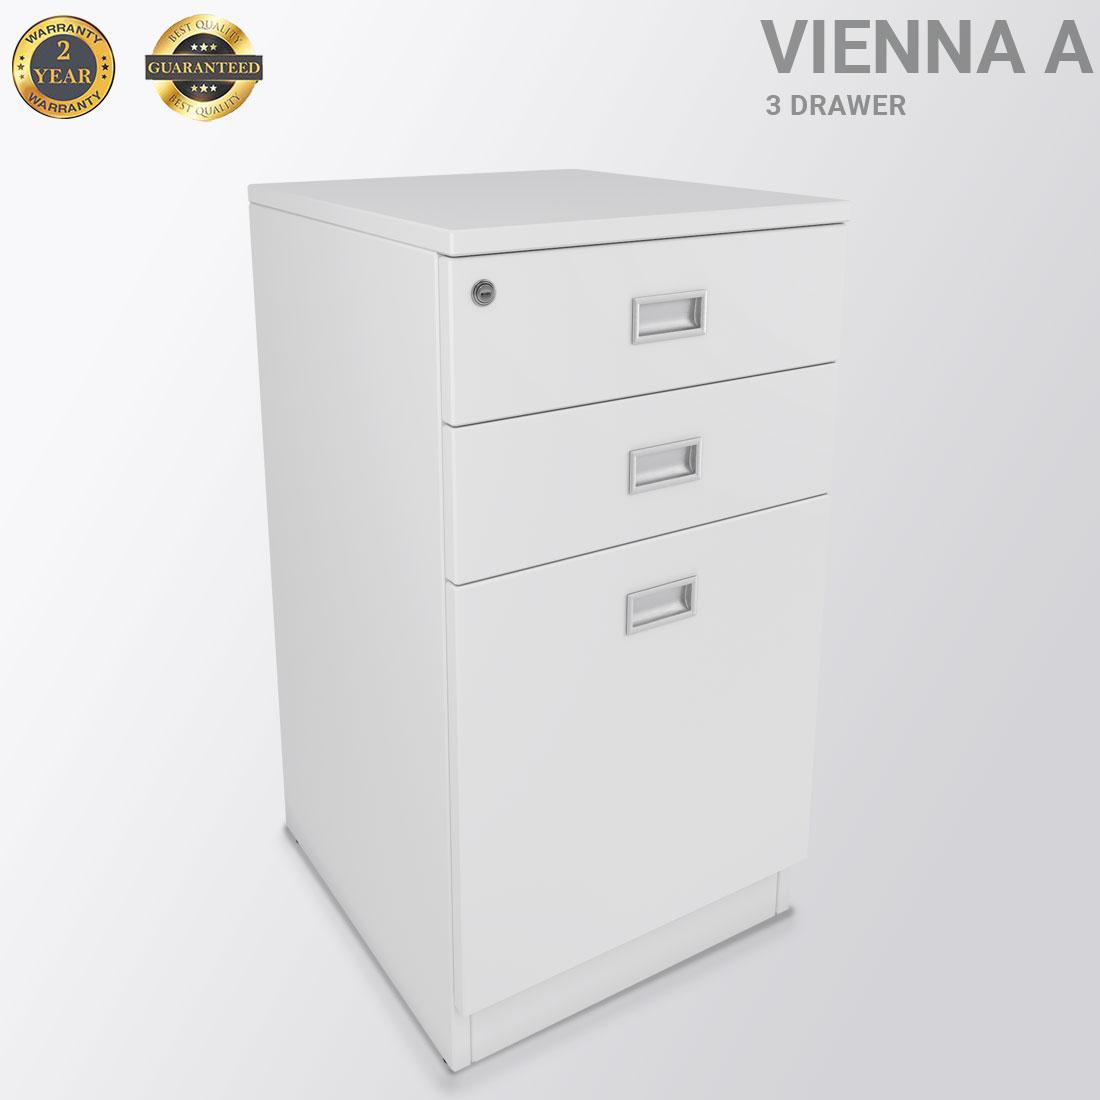 Vienna A